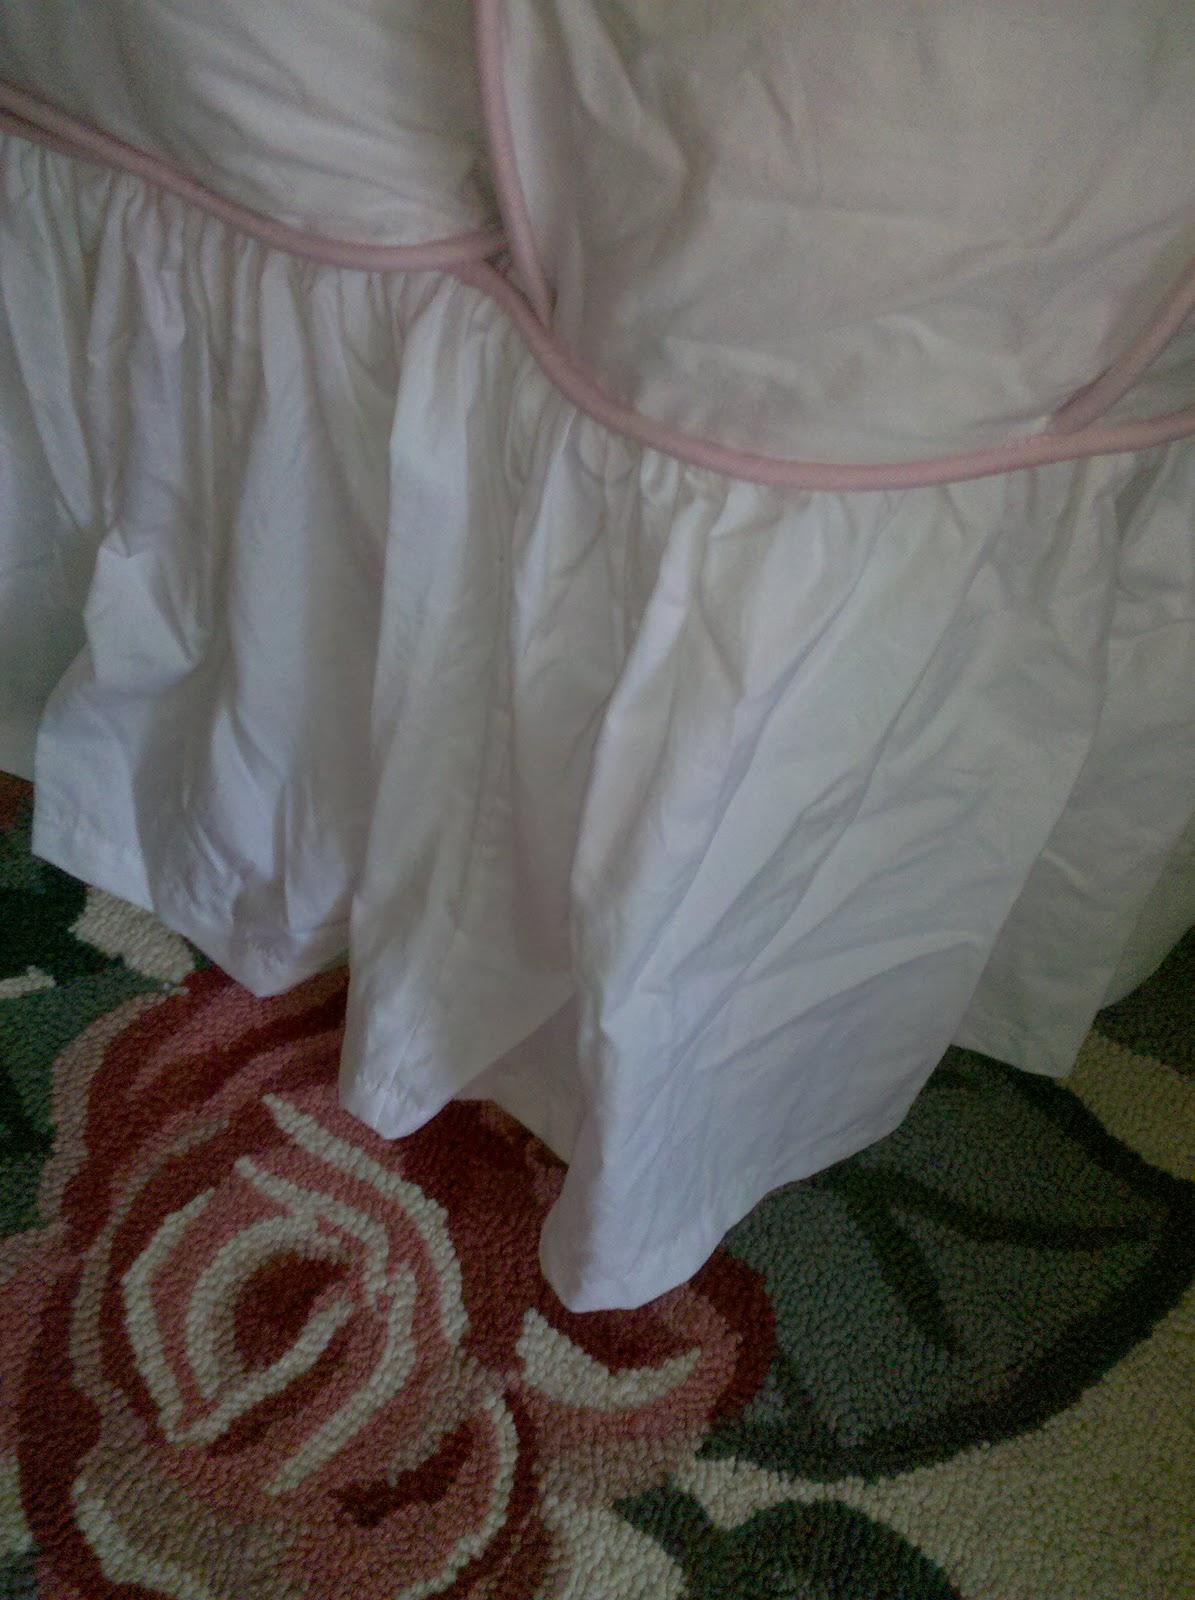 The Hopeless Romantic Slipcovers